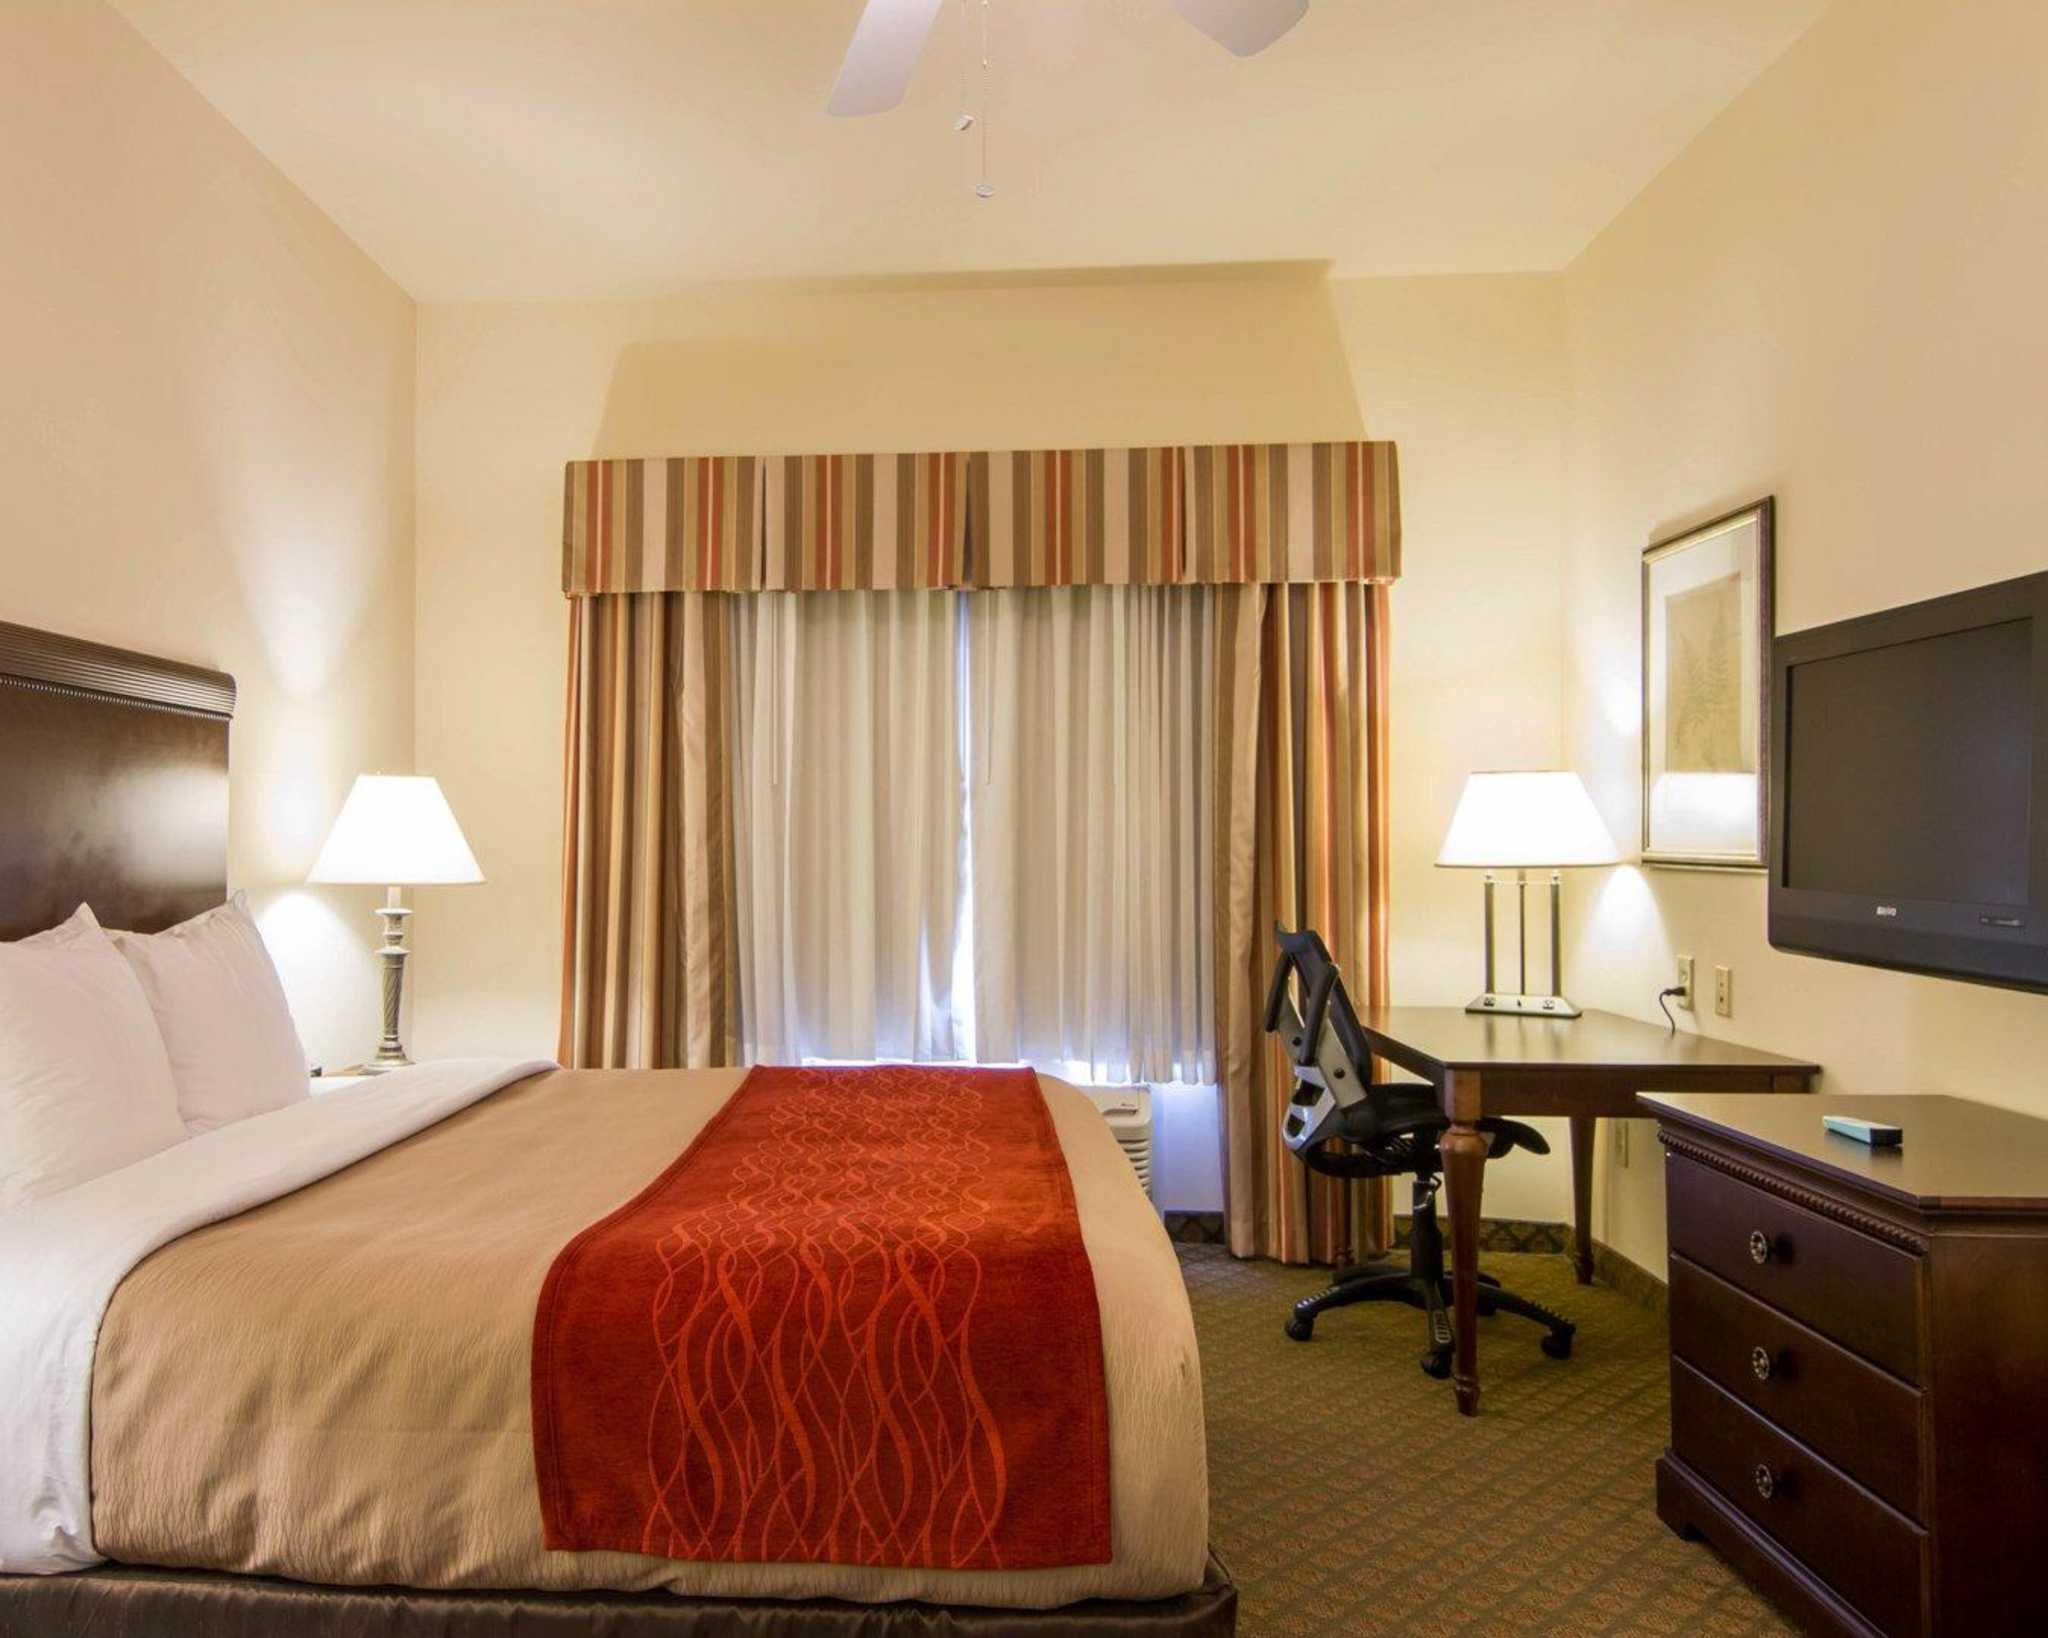 Comfort Inn & Suites Airport image 5